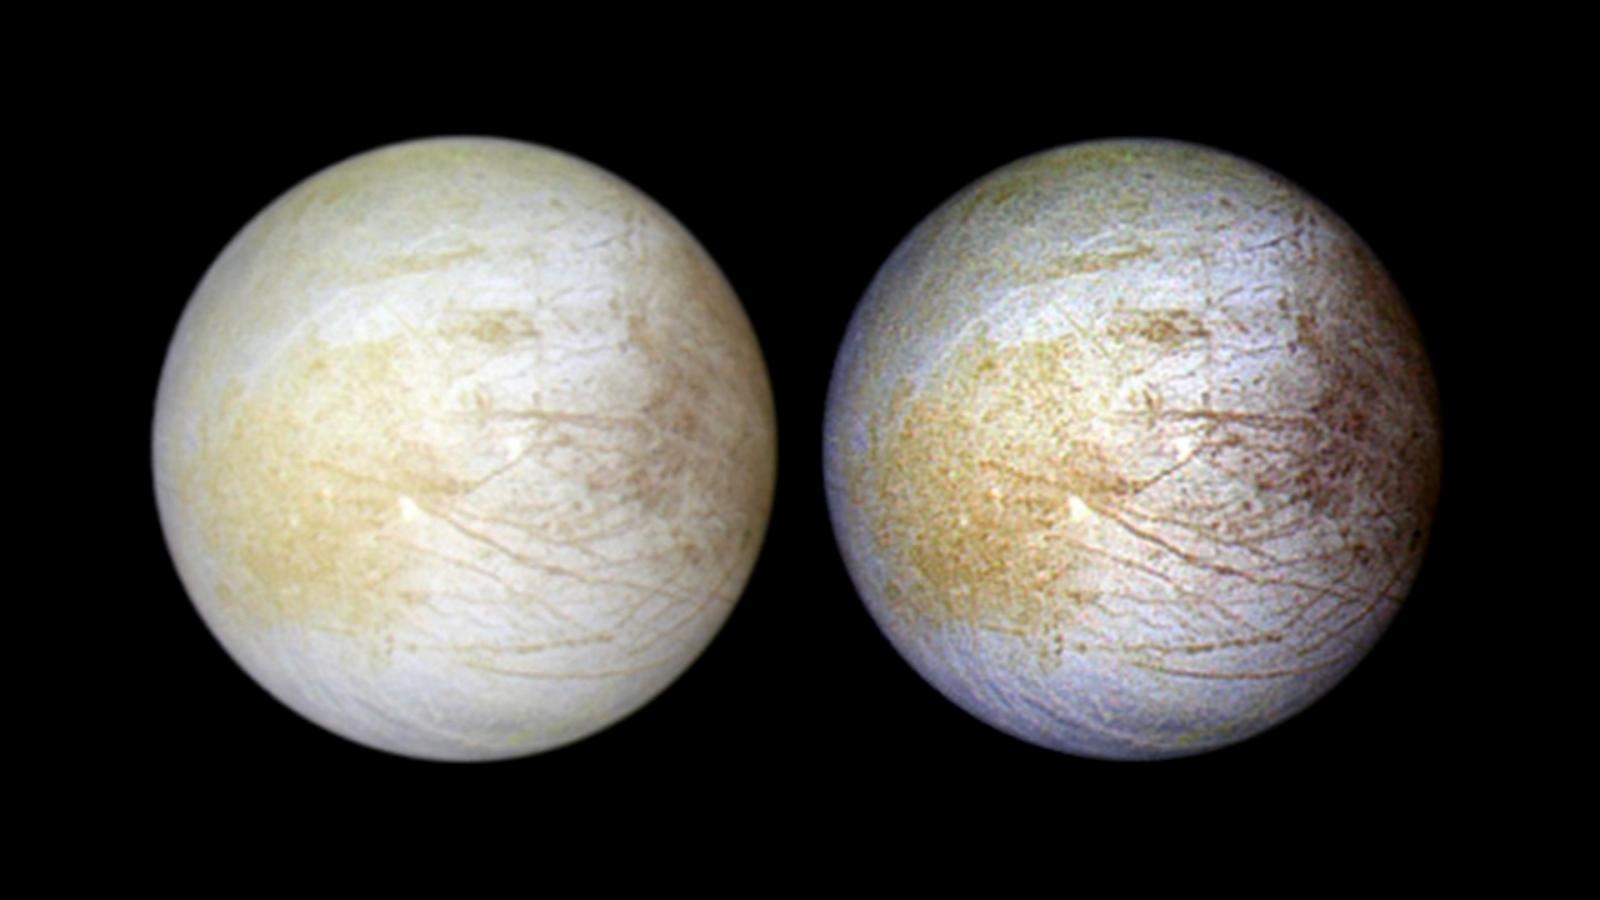 Evidence of water vapor found on Jupiter moon Europa, NASA says